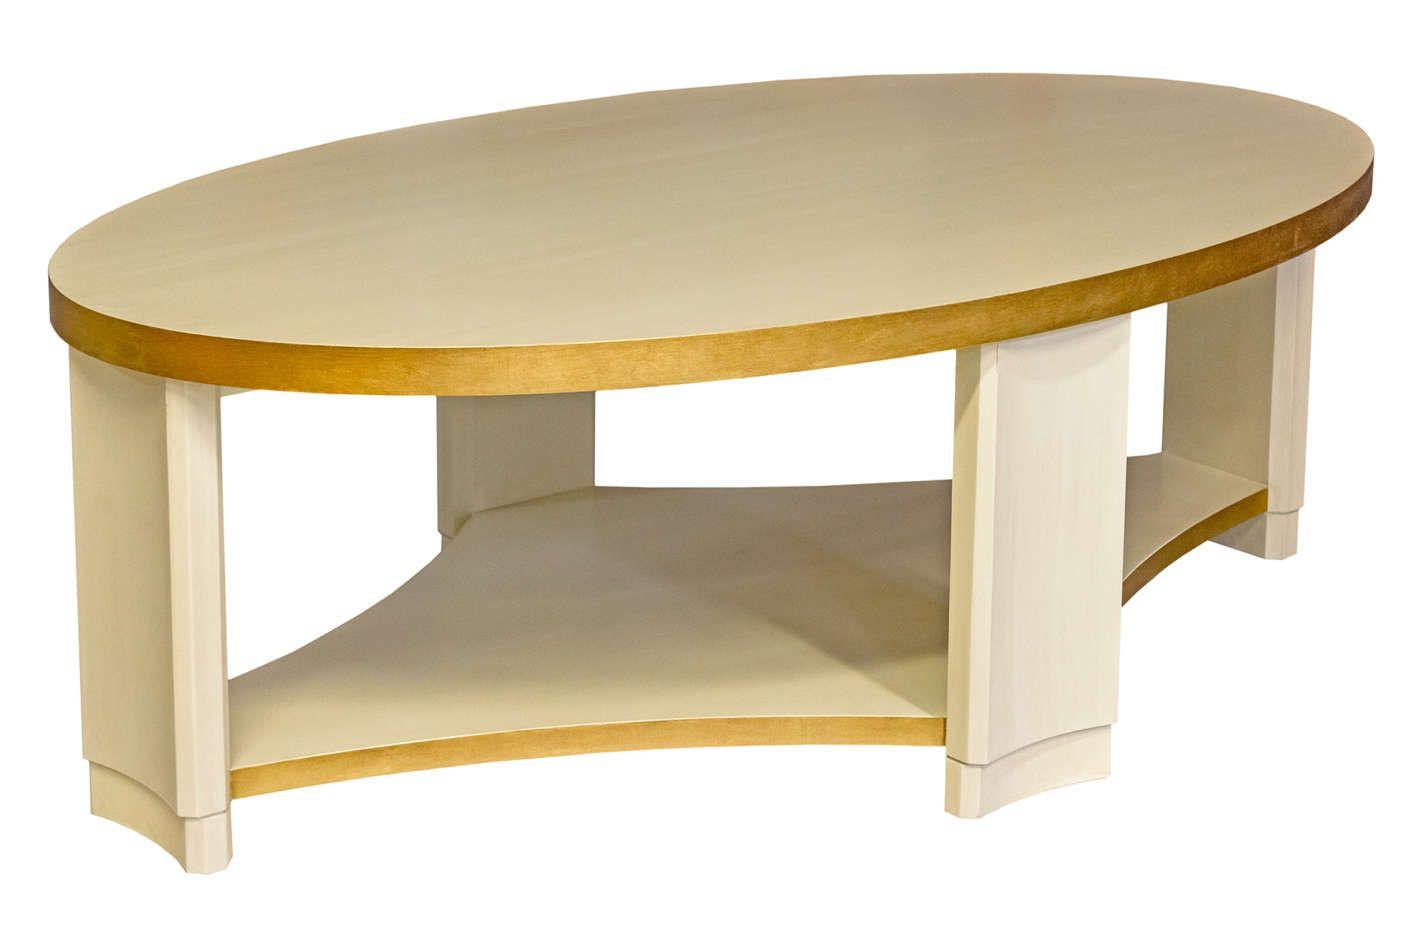 Monaco Ii Dorothy Draper Collection Facets The Monaco Ii Coffee Table Is Identical To The Original Monaco Cof Furniture Modern Glass Coffee Table Coffee Table [ 948 x 1422 Pixel ]